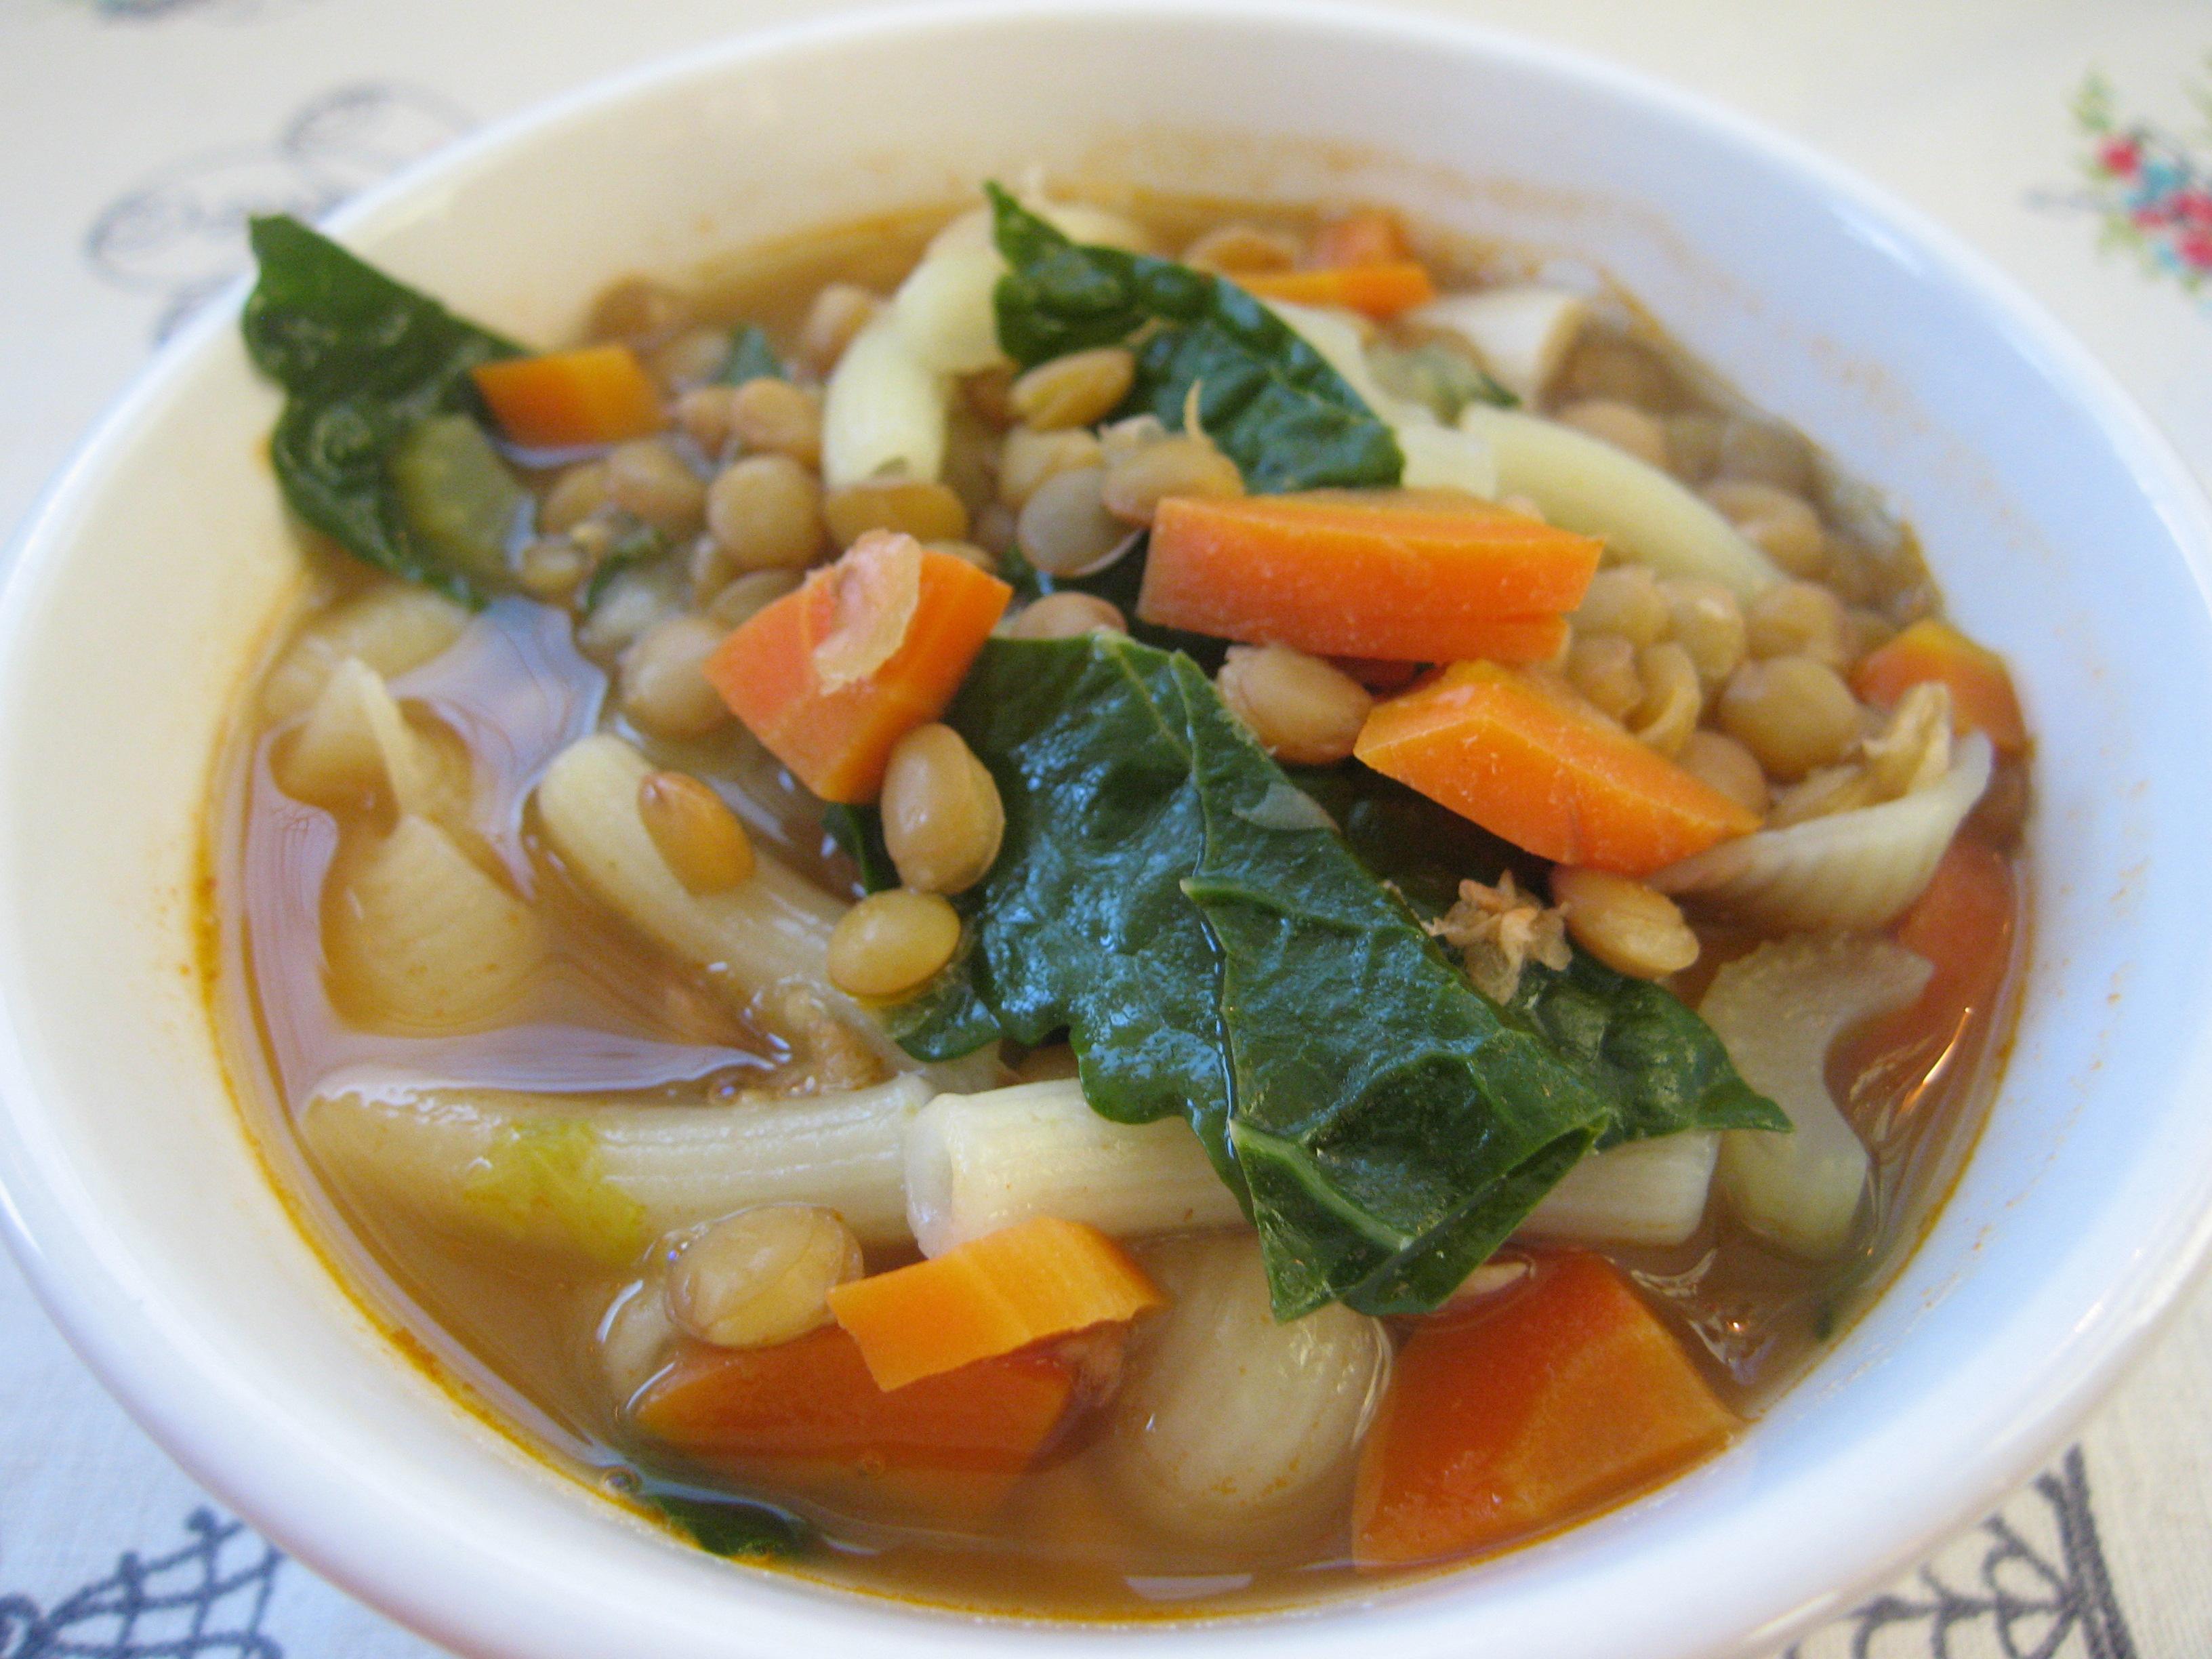 Grandmom's Lentil Soup